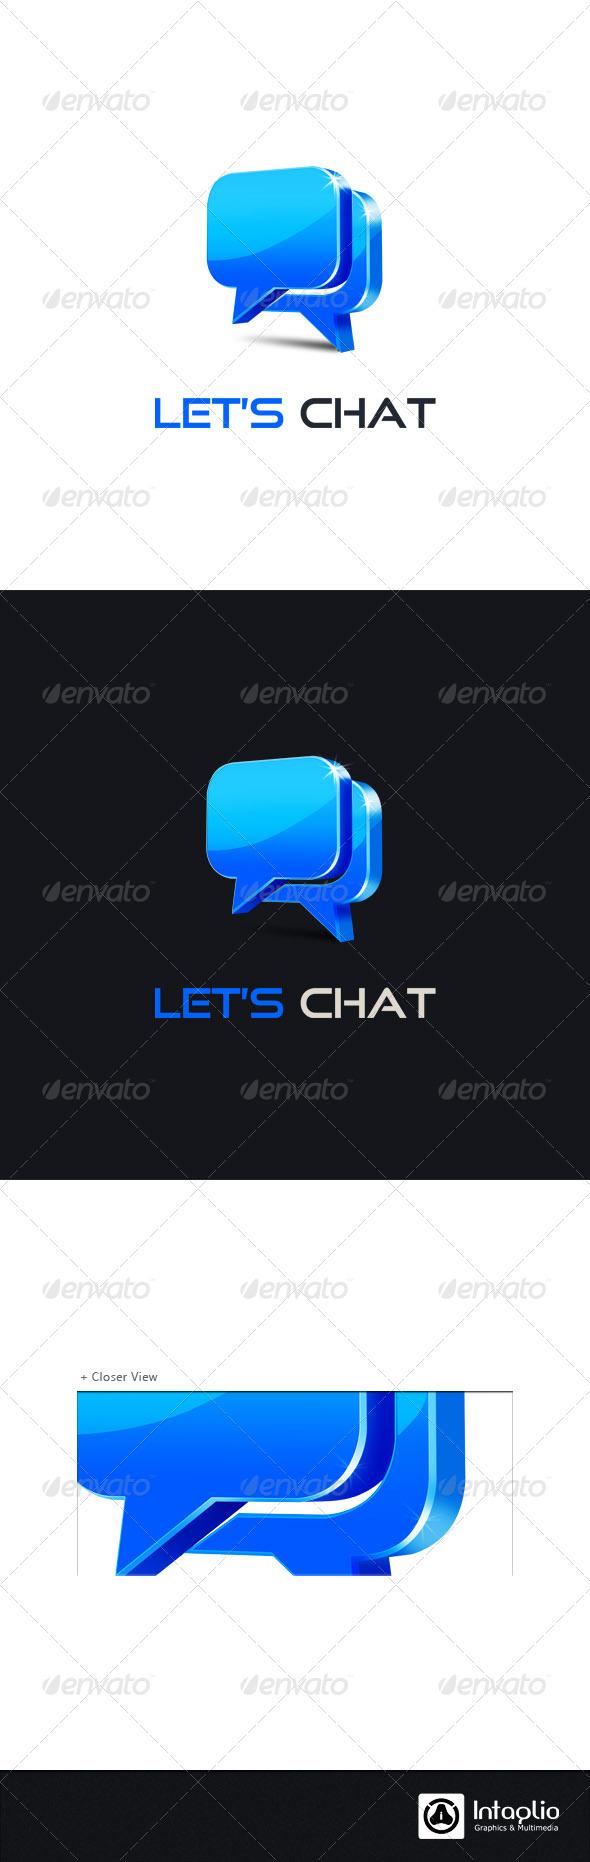 Social Media Logo - Let's Chat - 3d Abstract